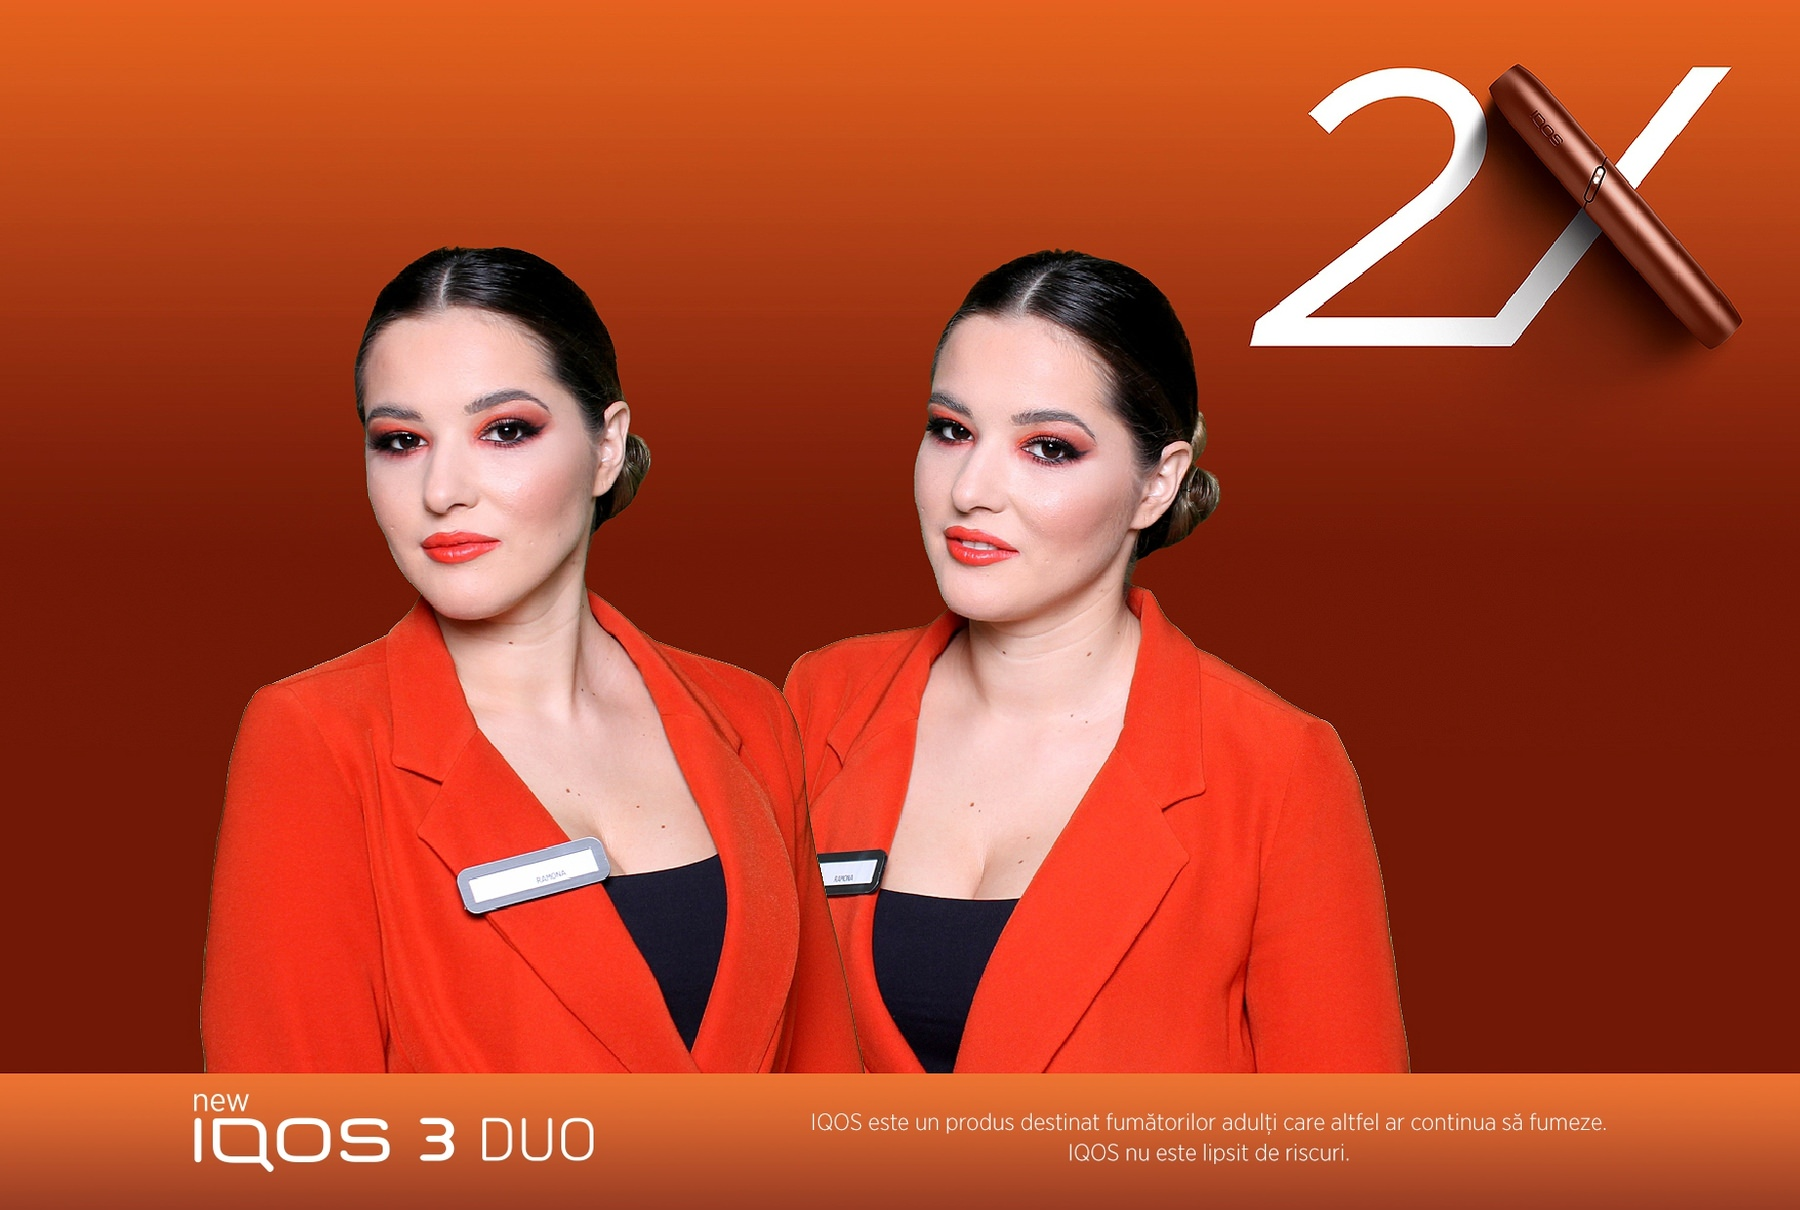 Activare-de-brand-lansare-iqos-3-duo